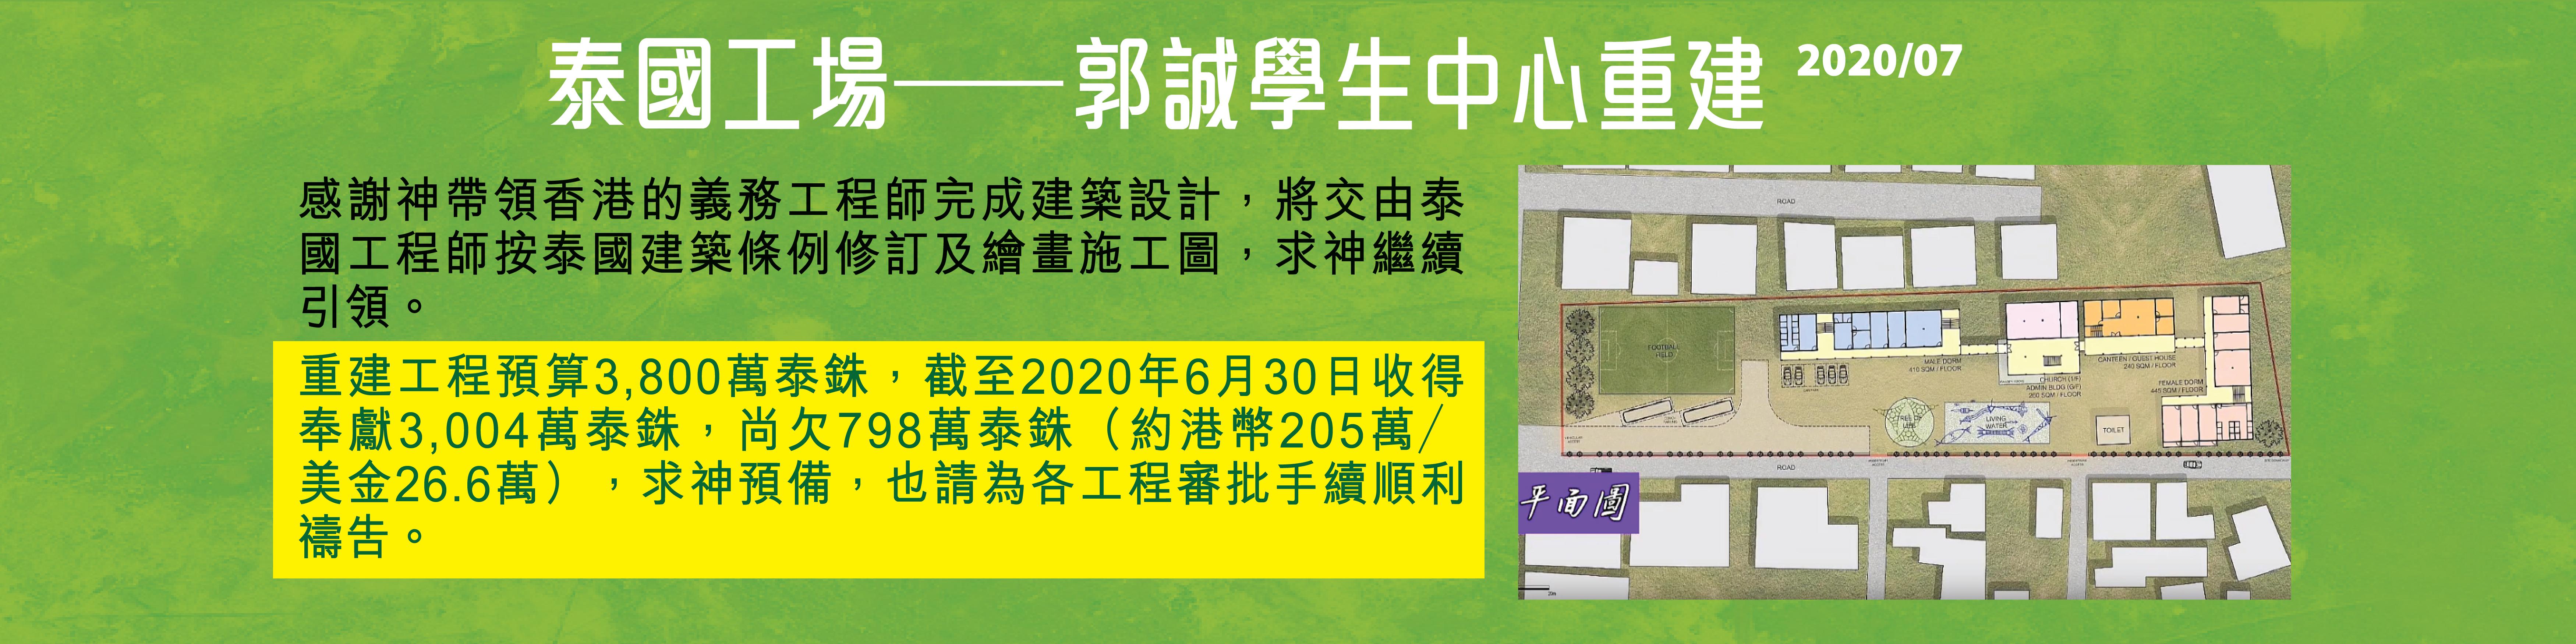 2020-CB-02-web-banner-1680-x-420-02-1